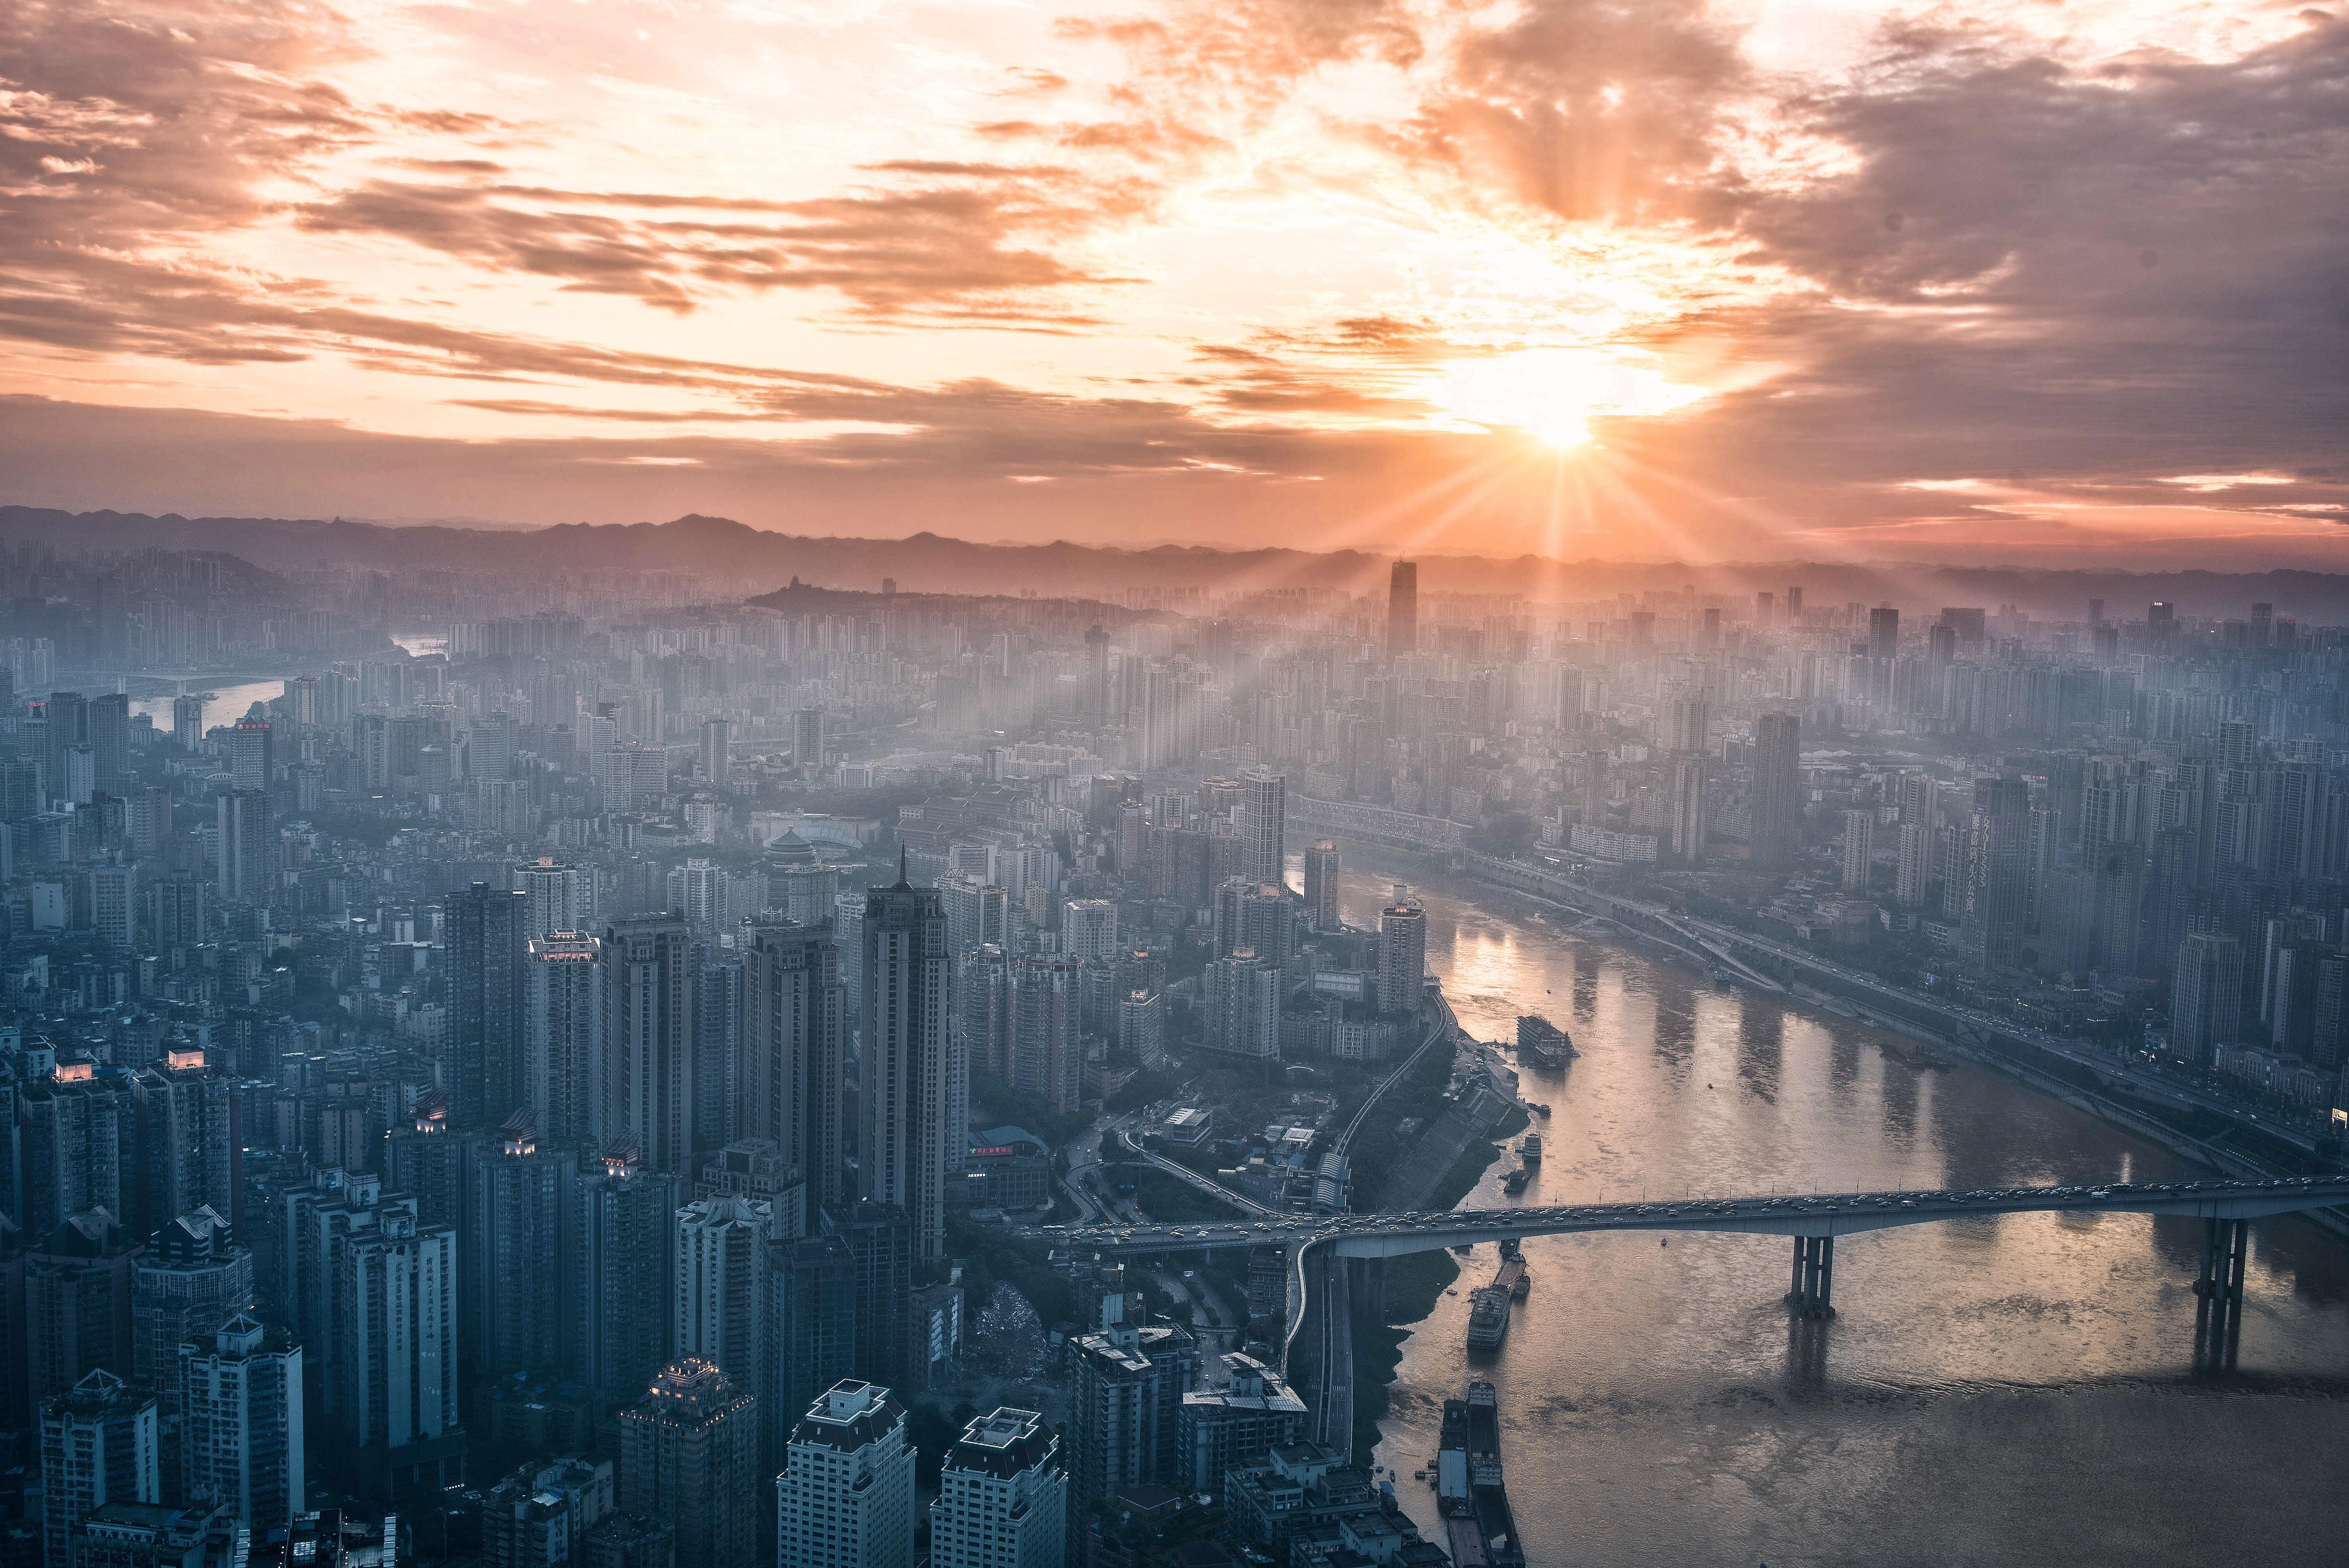 Horizon Cloud Sky Sunrise Sunset Skyline Sunlight Morning Dawn City Atmosphere Skyscraper Cityscape Dusk Daytime Evening